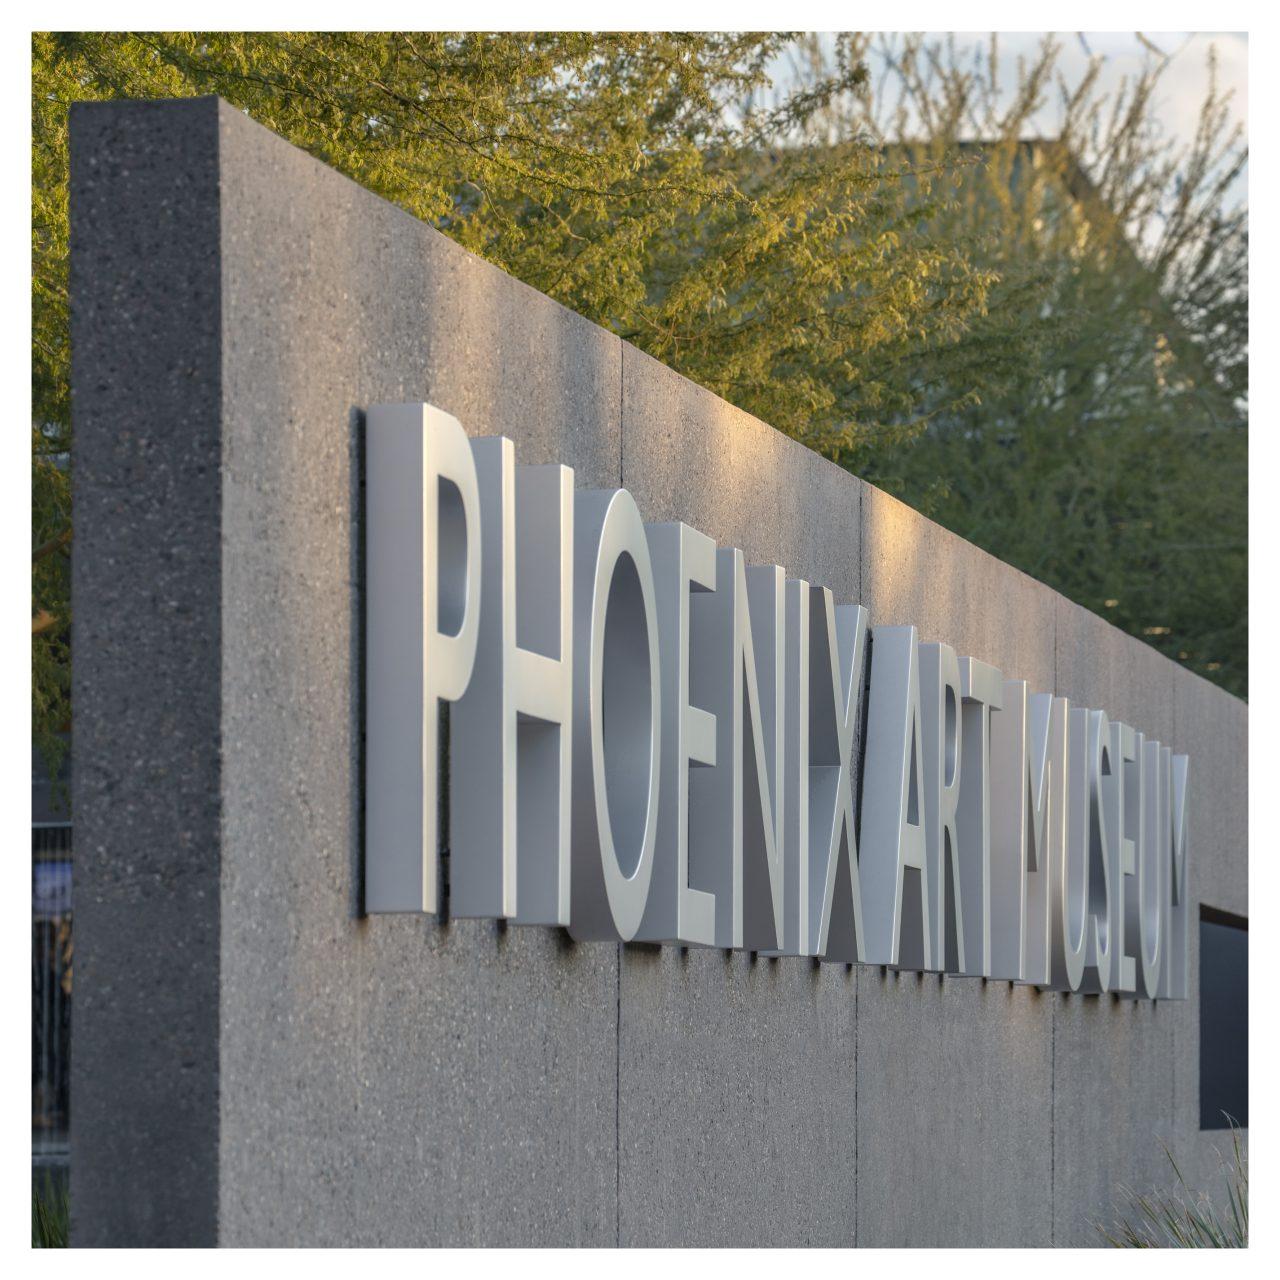 https://www.phoenixmag.com/wp-content/uploads/2020/10/T18_4451a-1280x1280.jpg